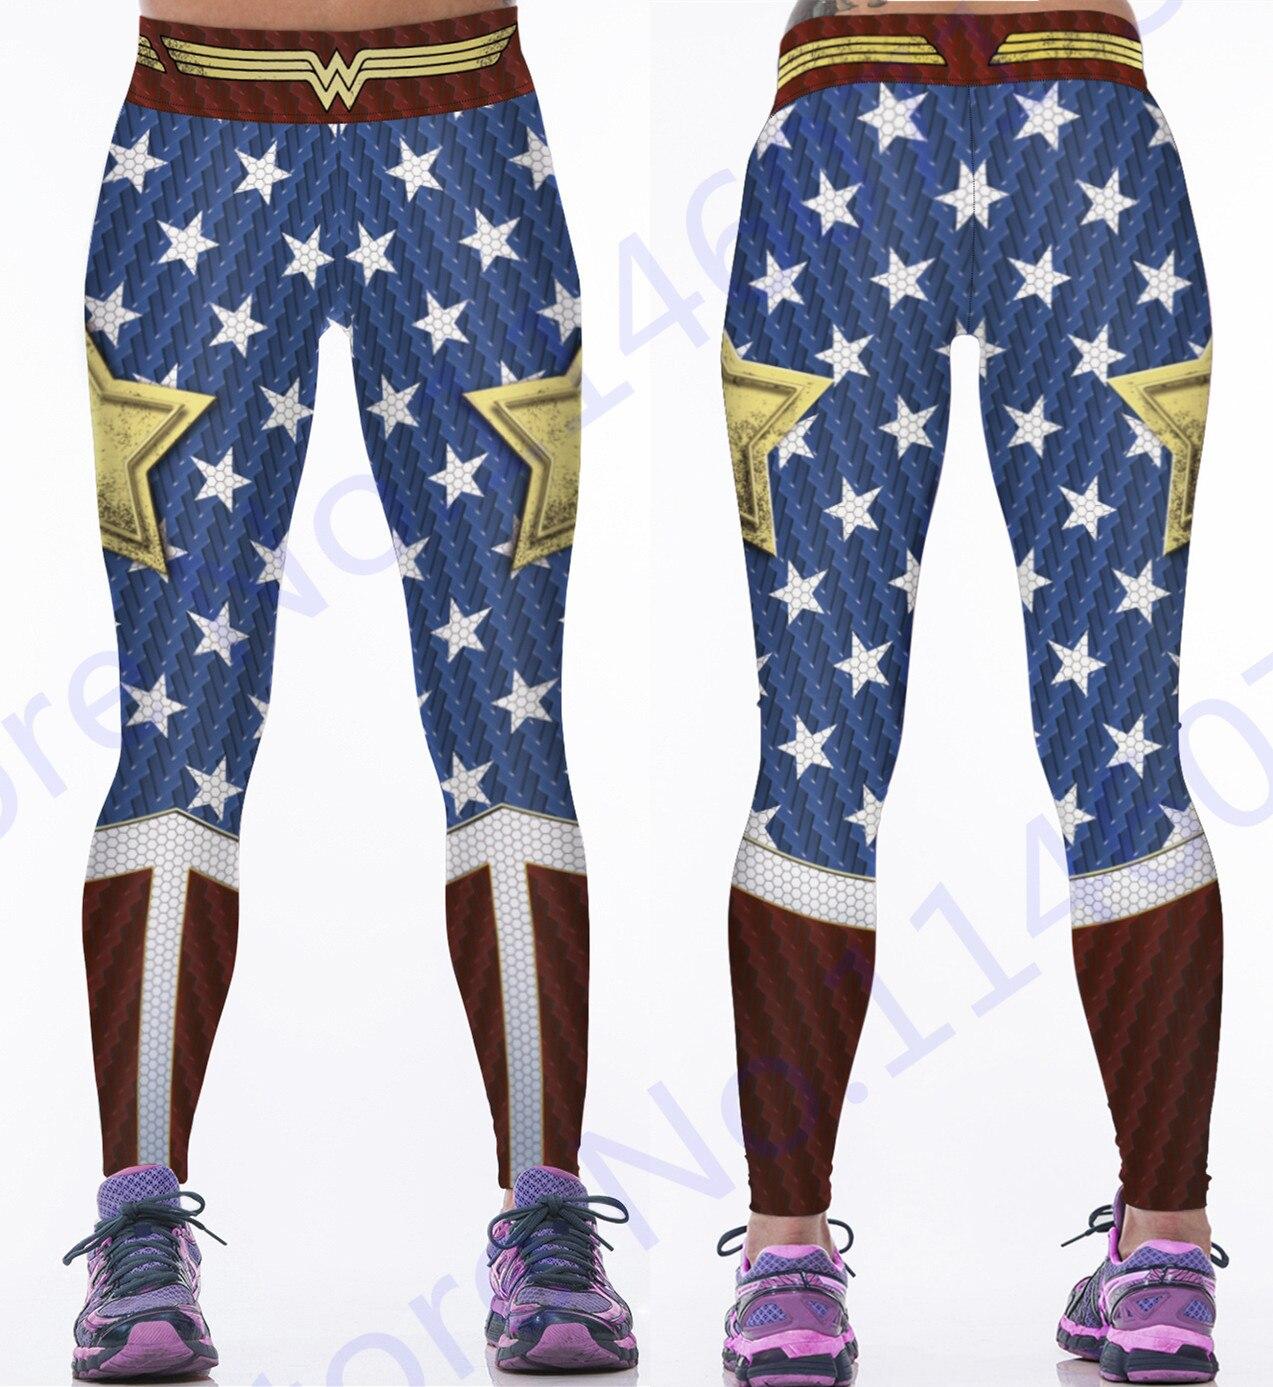 fc8ddbf957e51 Buy wonder women pants and get free shipping on AliExpress.com